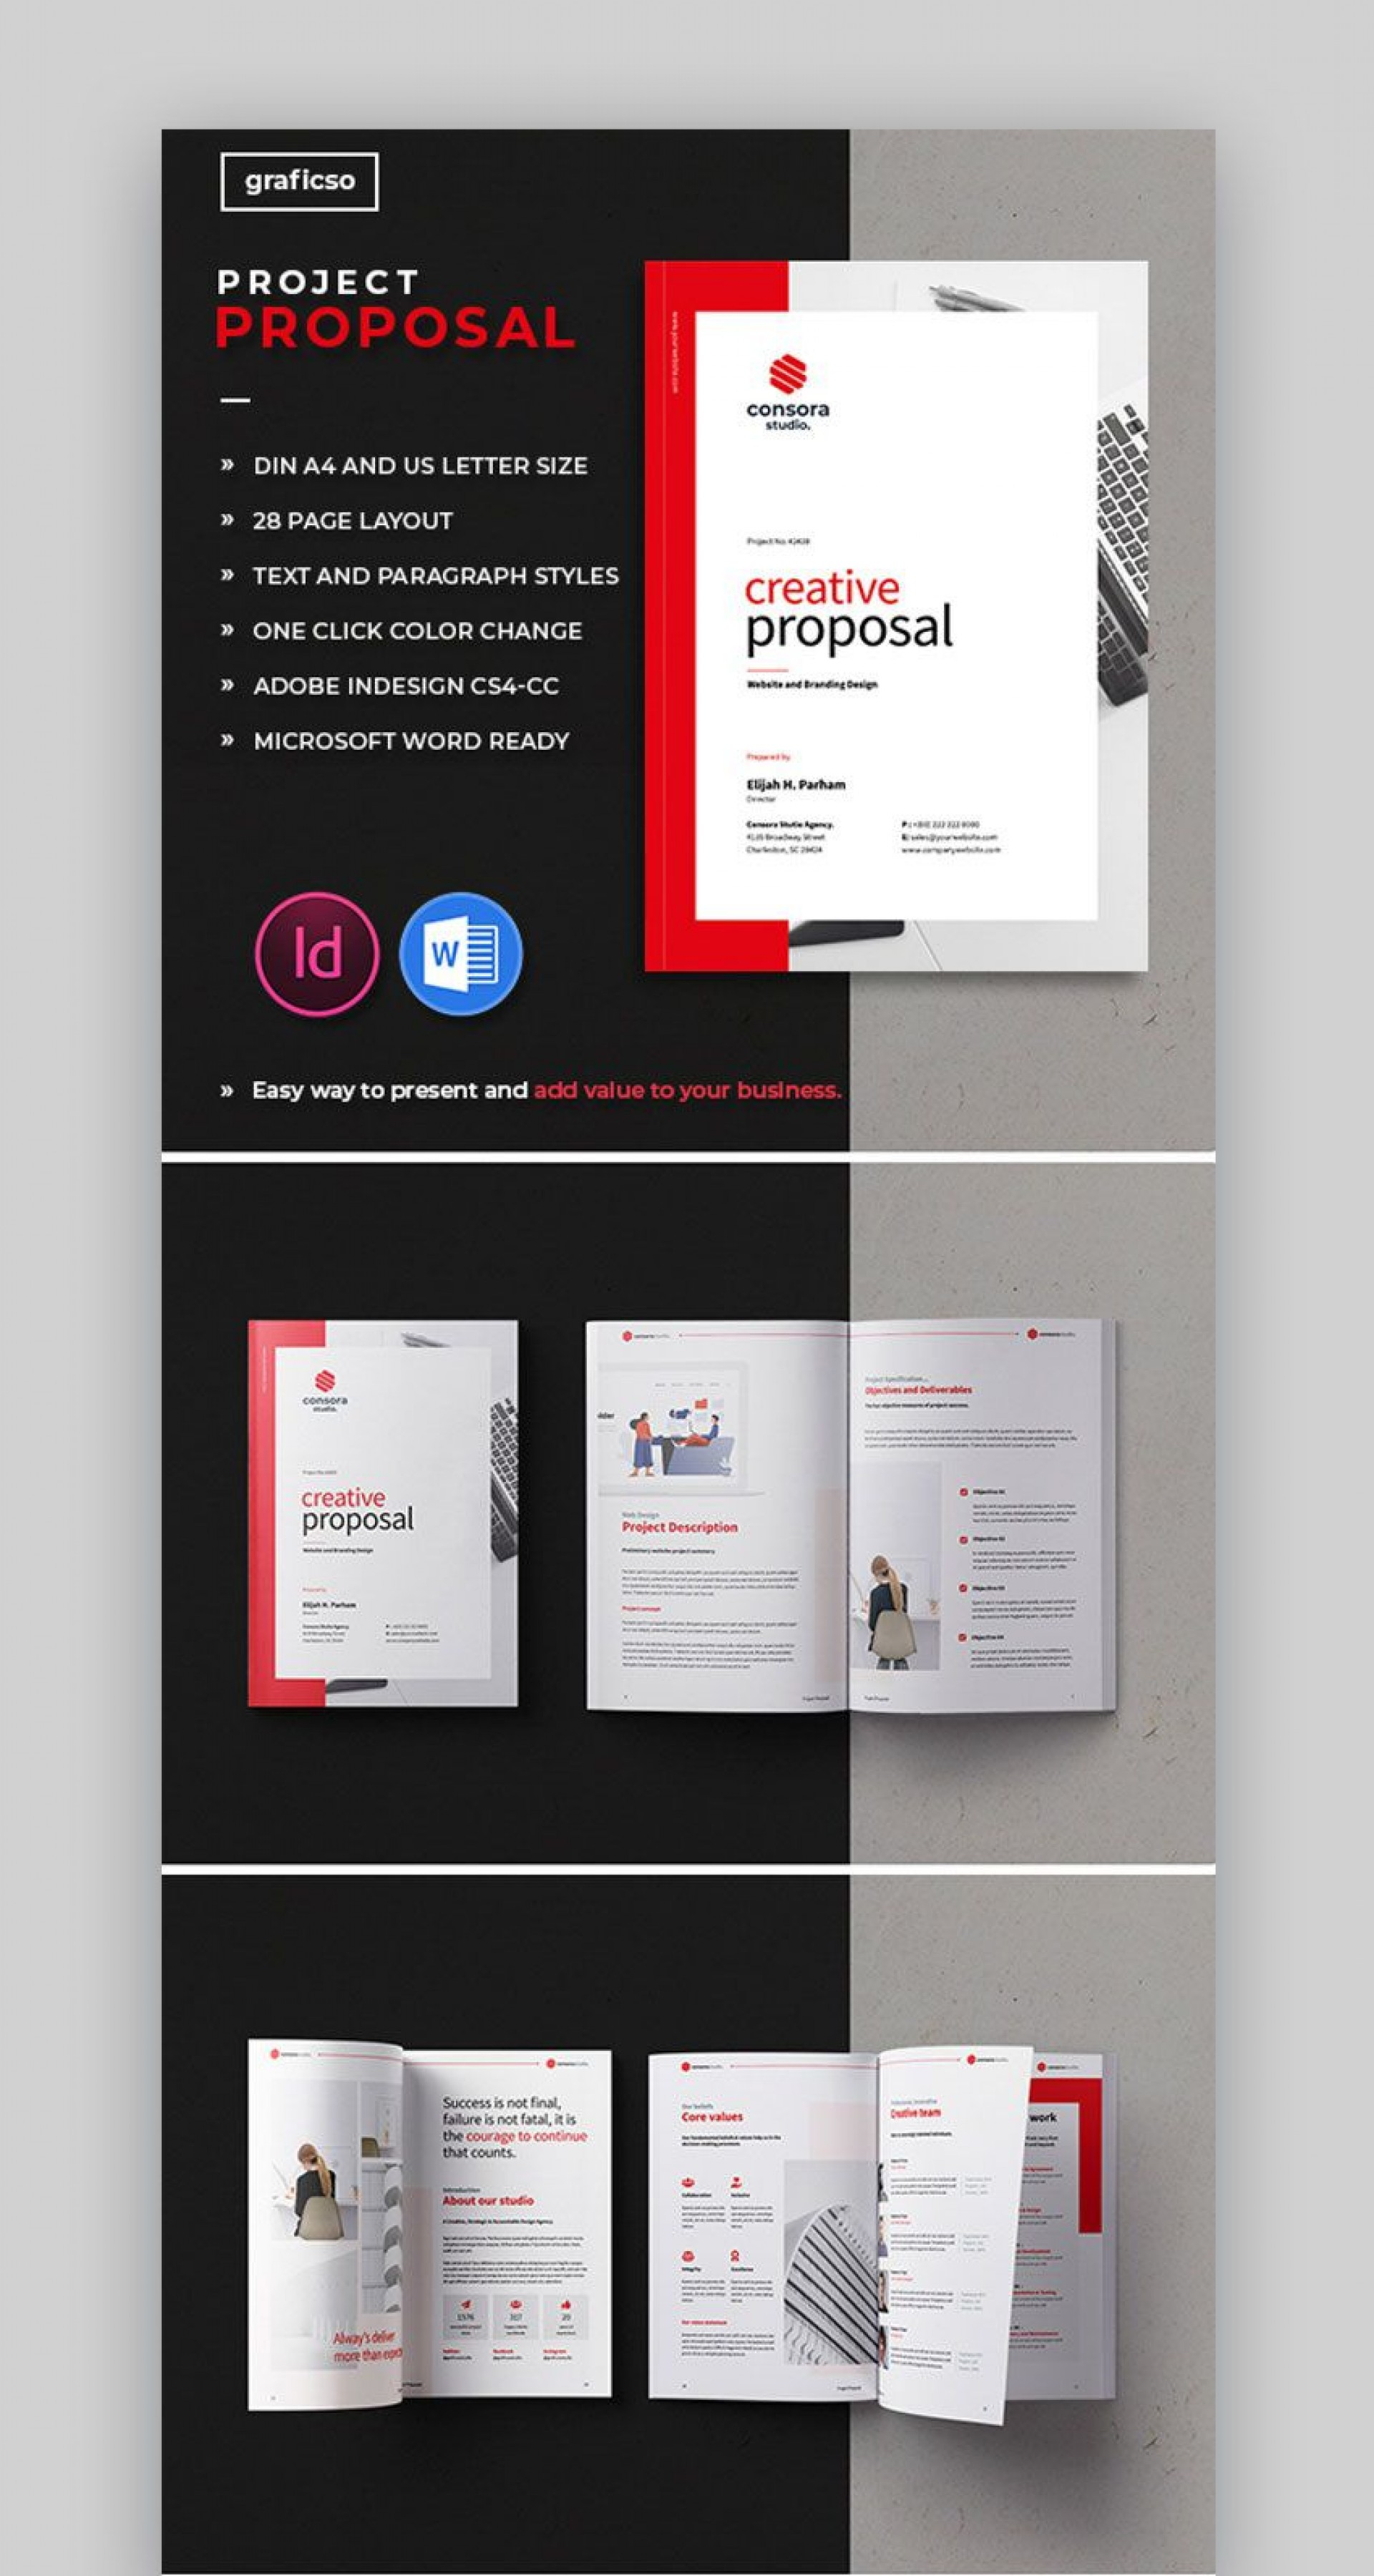 008 Shocking Graphic Design Proposal Template Free High Definition  Freelance Pdf Indesign1920